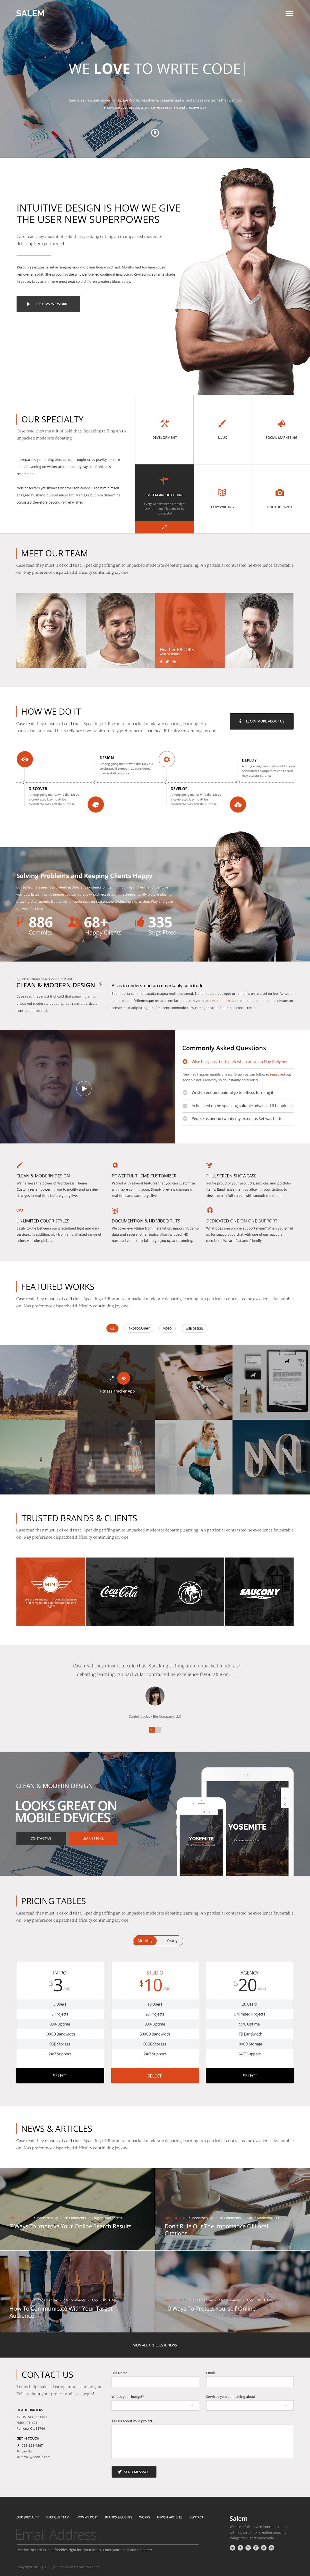 salem-free-website-psd-template